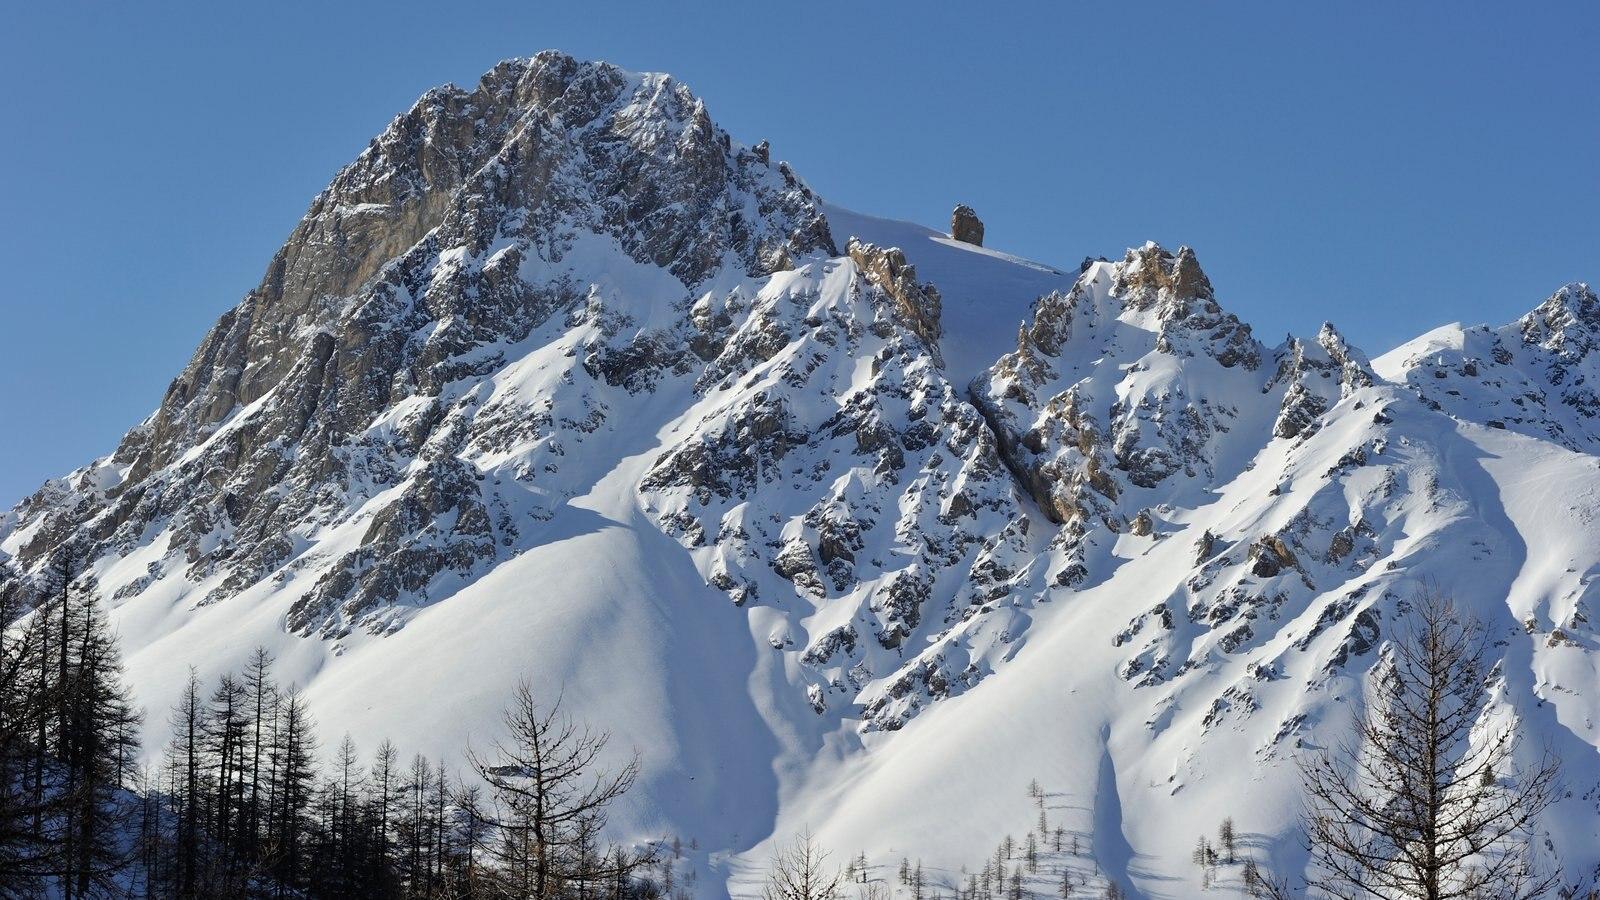 Bardonecchia Ski Resort showing mountains and snow